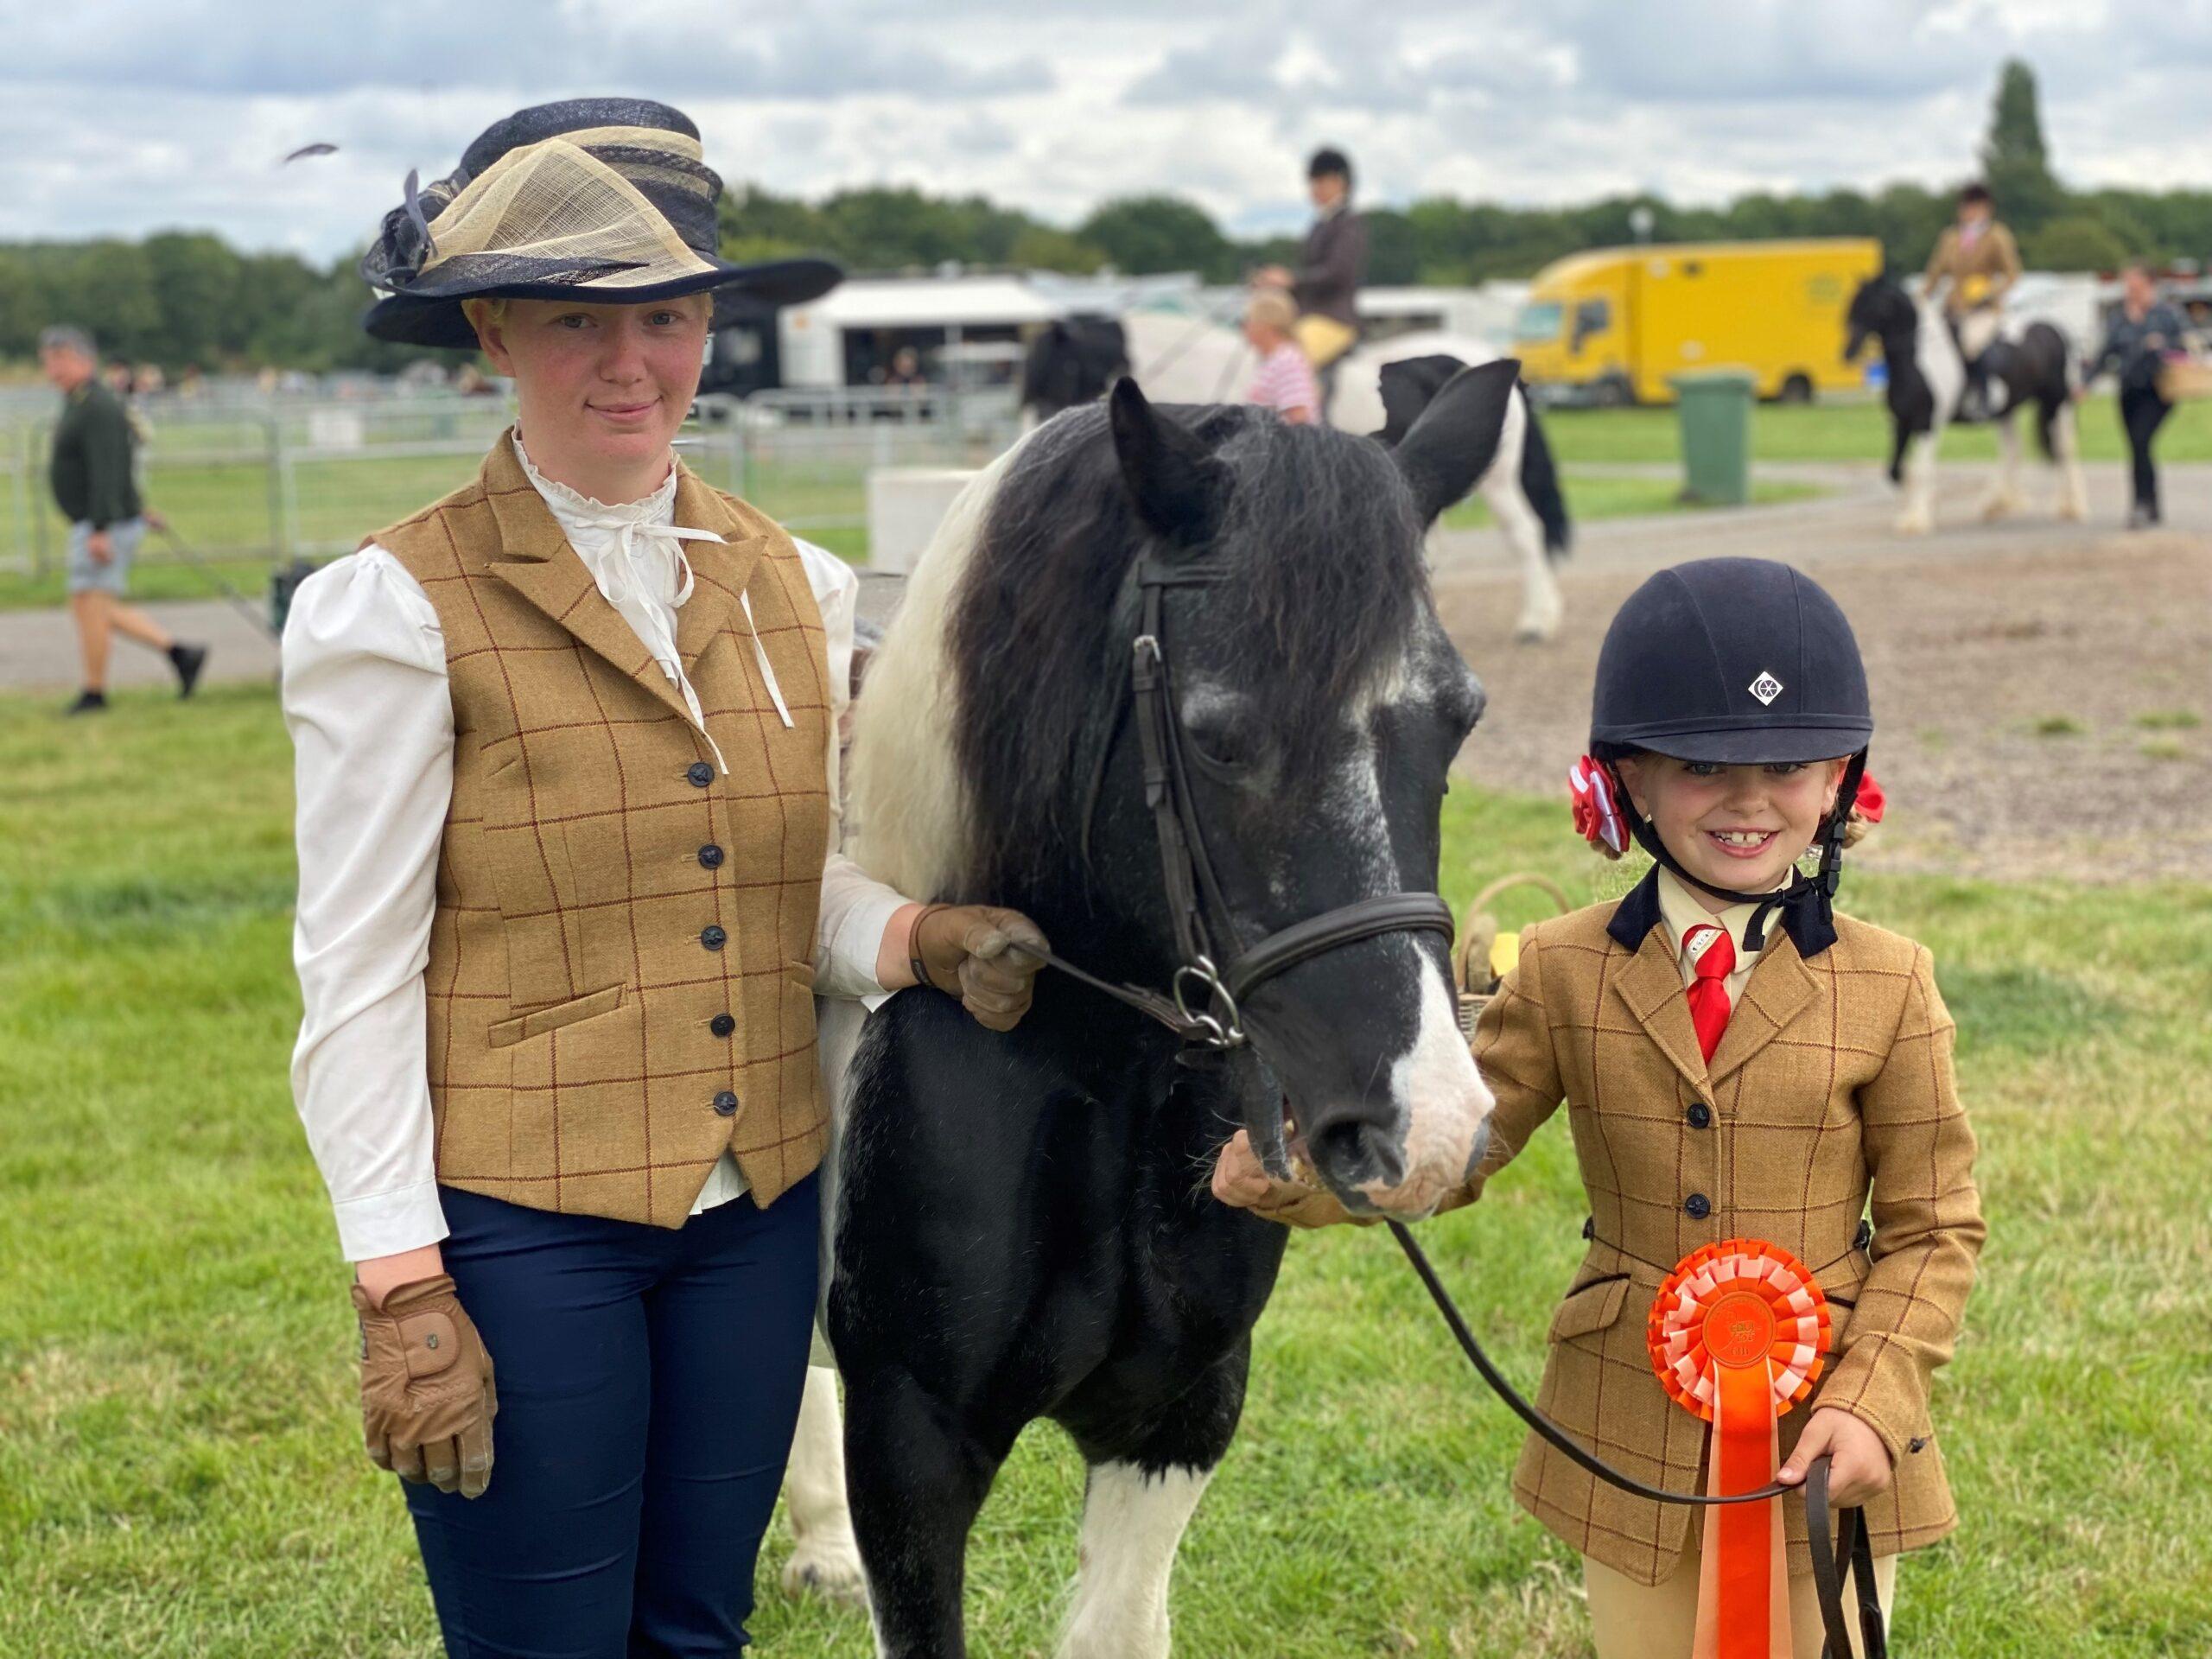 Molly Magnus equestrian ii scaled